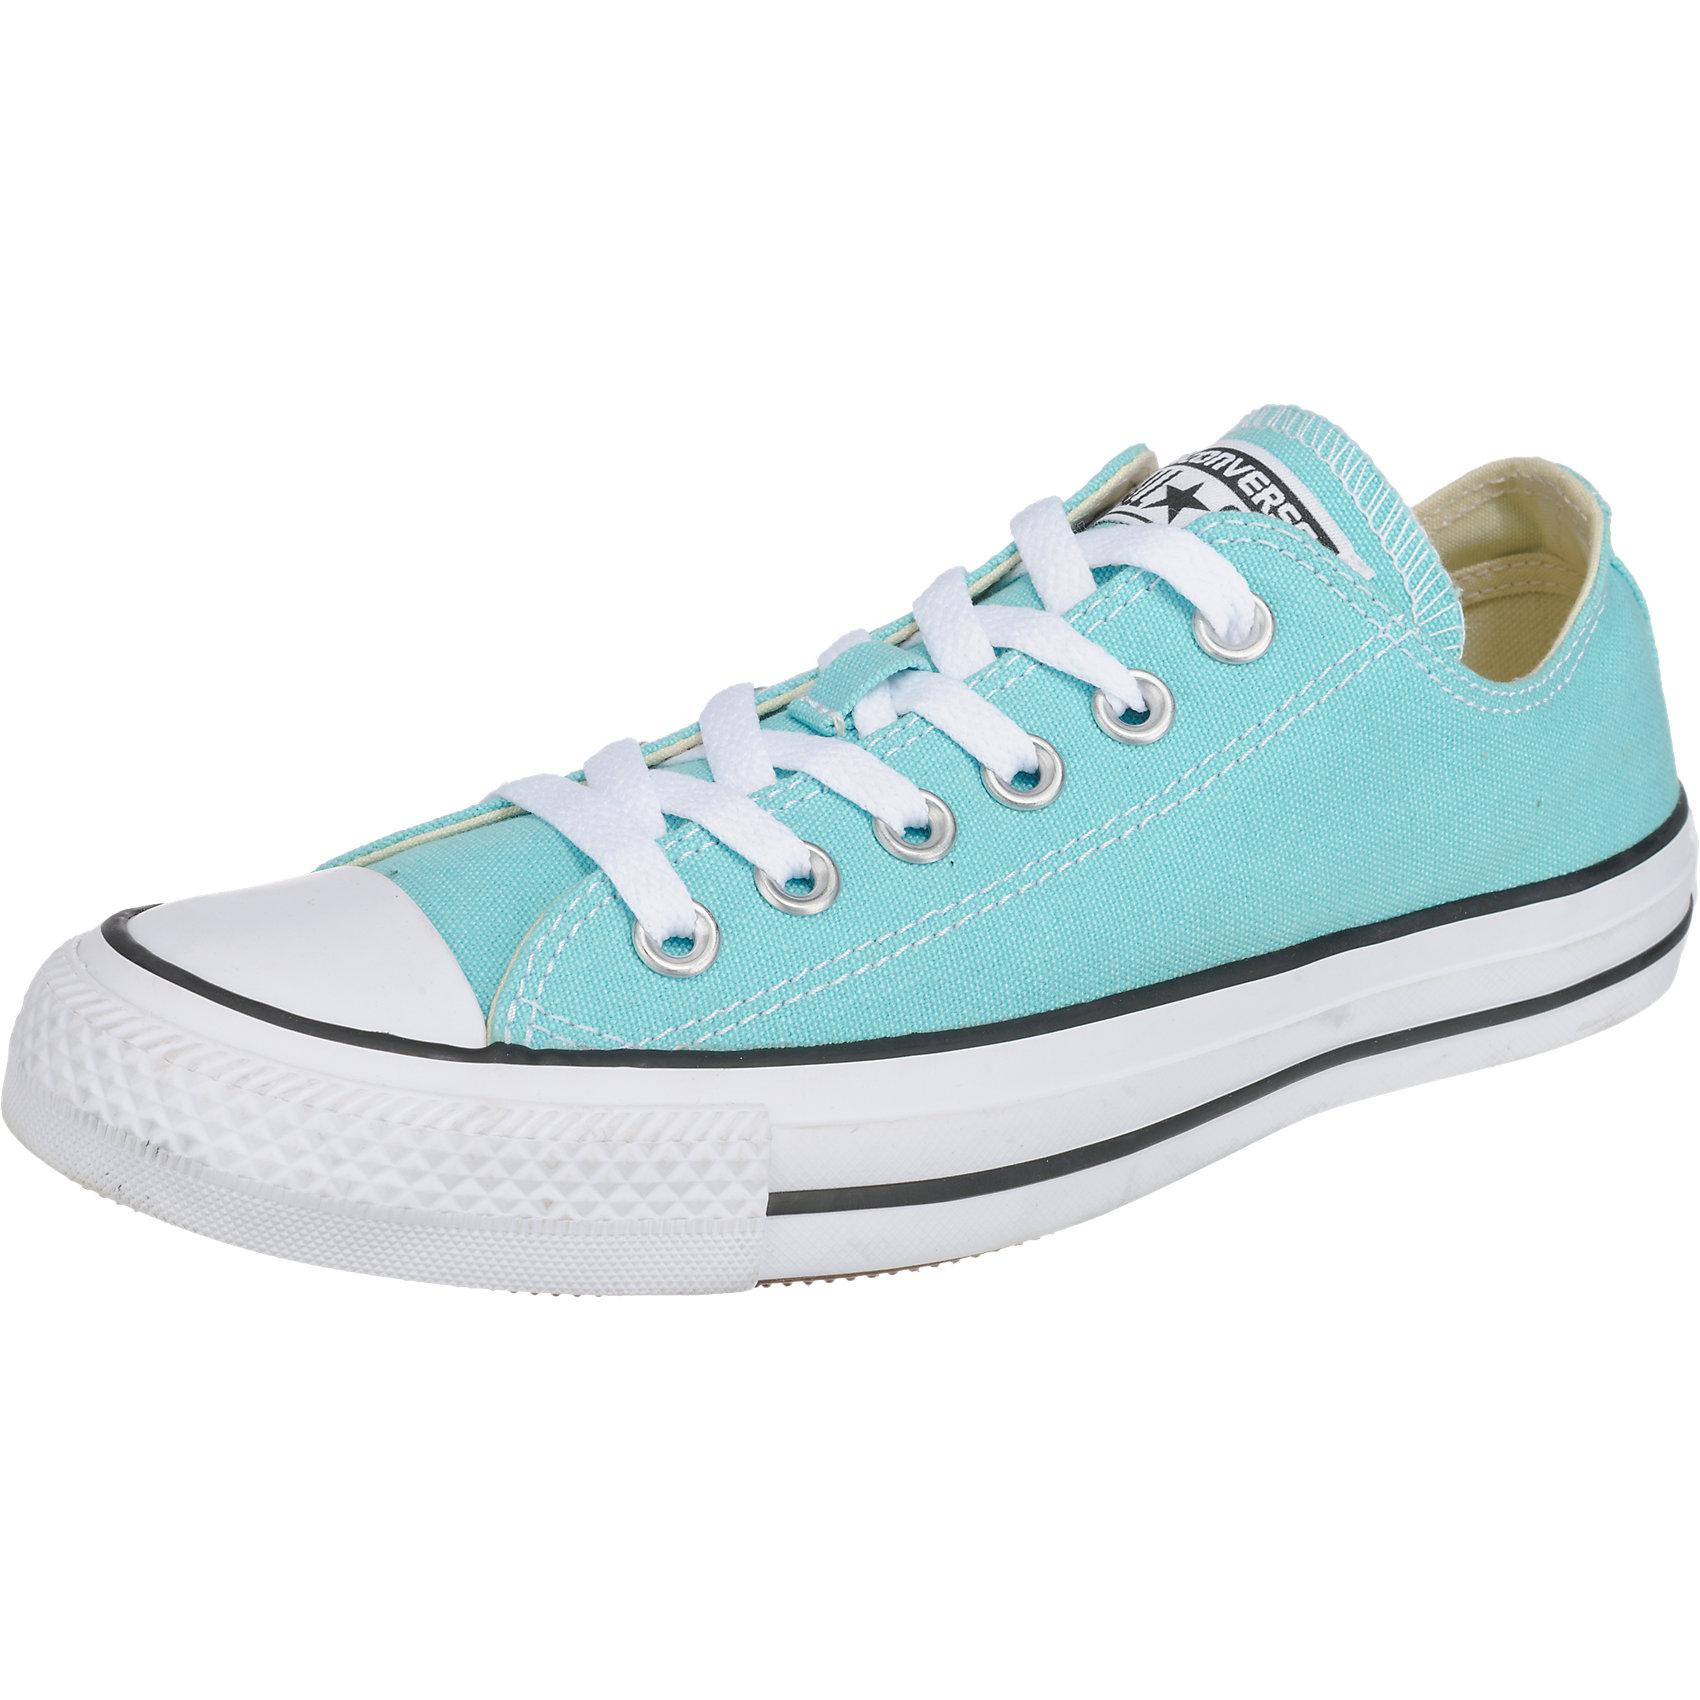 3e5e31d0628f netherlands neu converse chuck taylor all star ox sneakers fc8f2 e2871